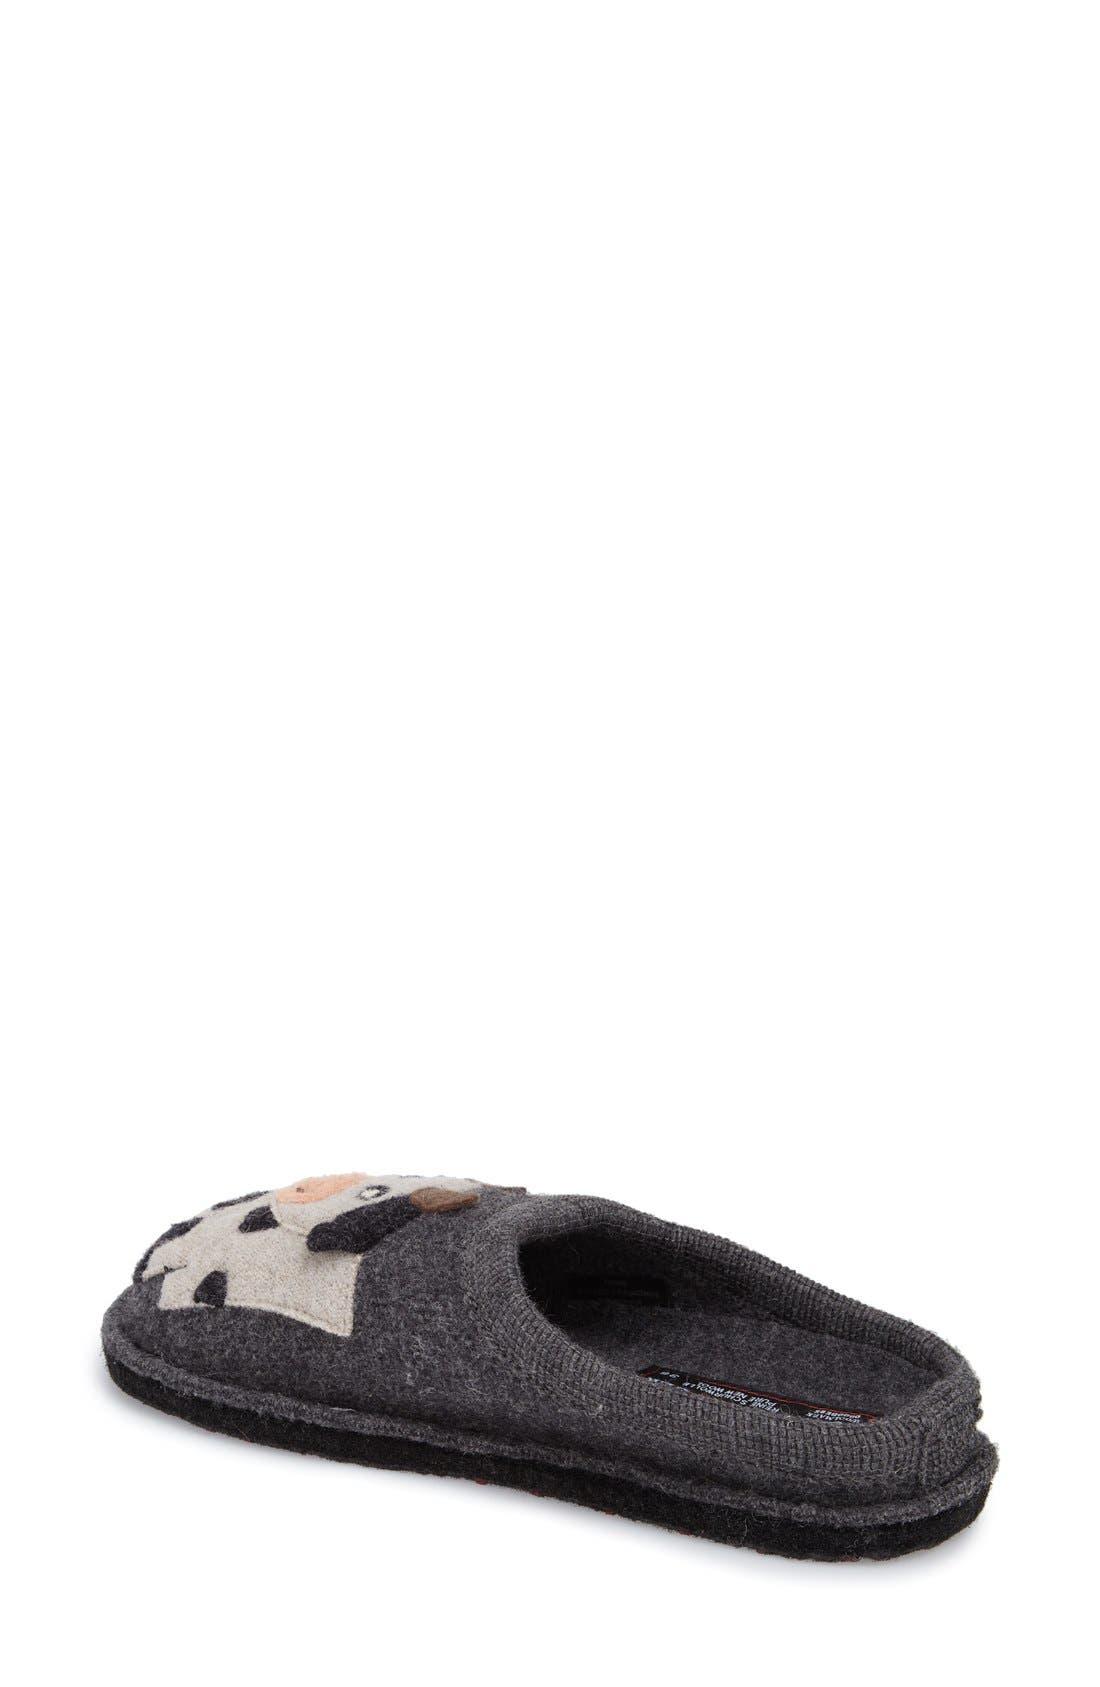 'Cow' Slipper,                             Alternate thumbnail 2, color,                             Grey Wool